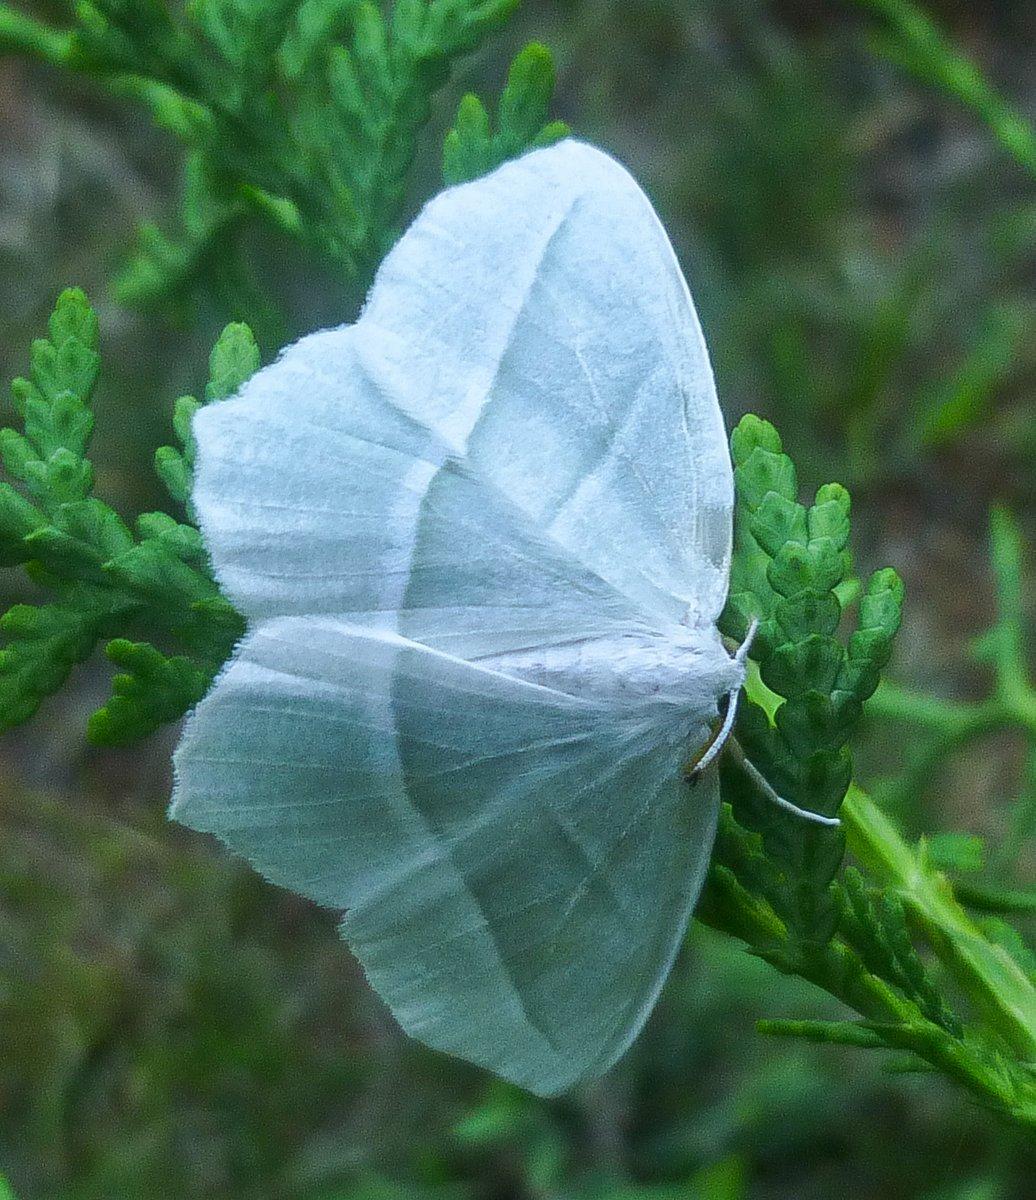 2. Pale Beauty Moth aka Campaea perlata